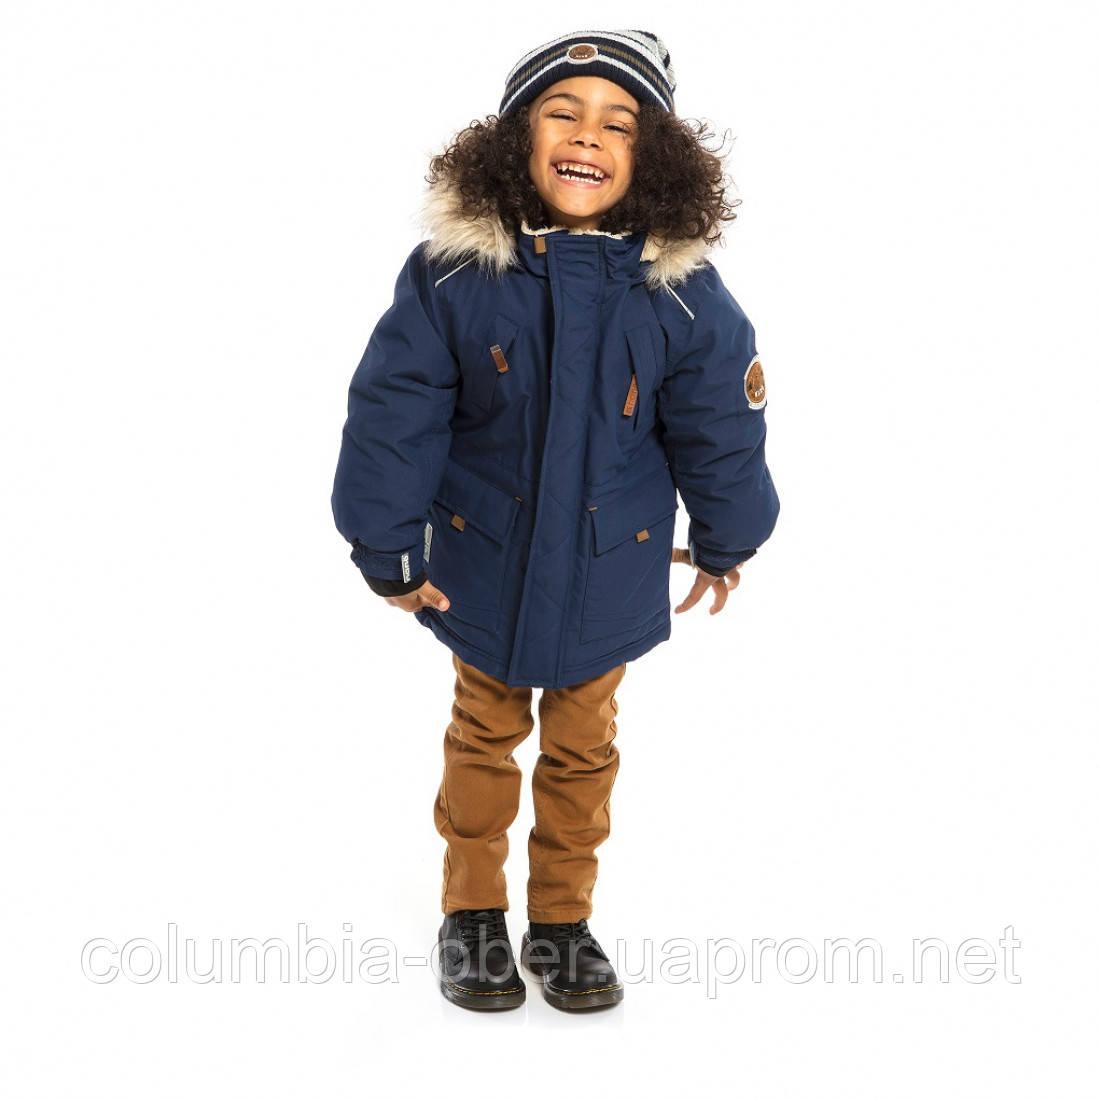 Зимняя куртка - парка для мальчика NANO F19M1301 Navy. Размеры 2 - 14 лет.